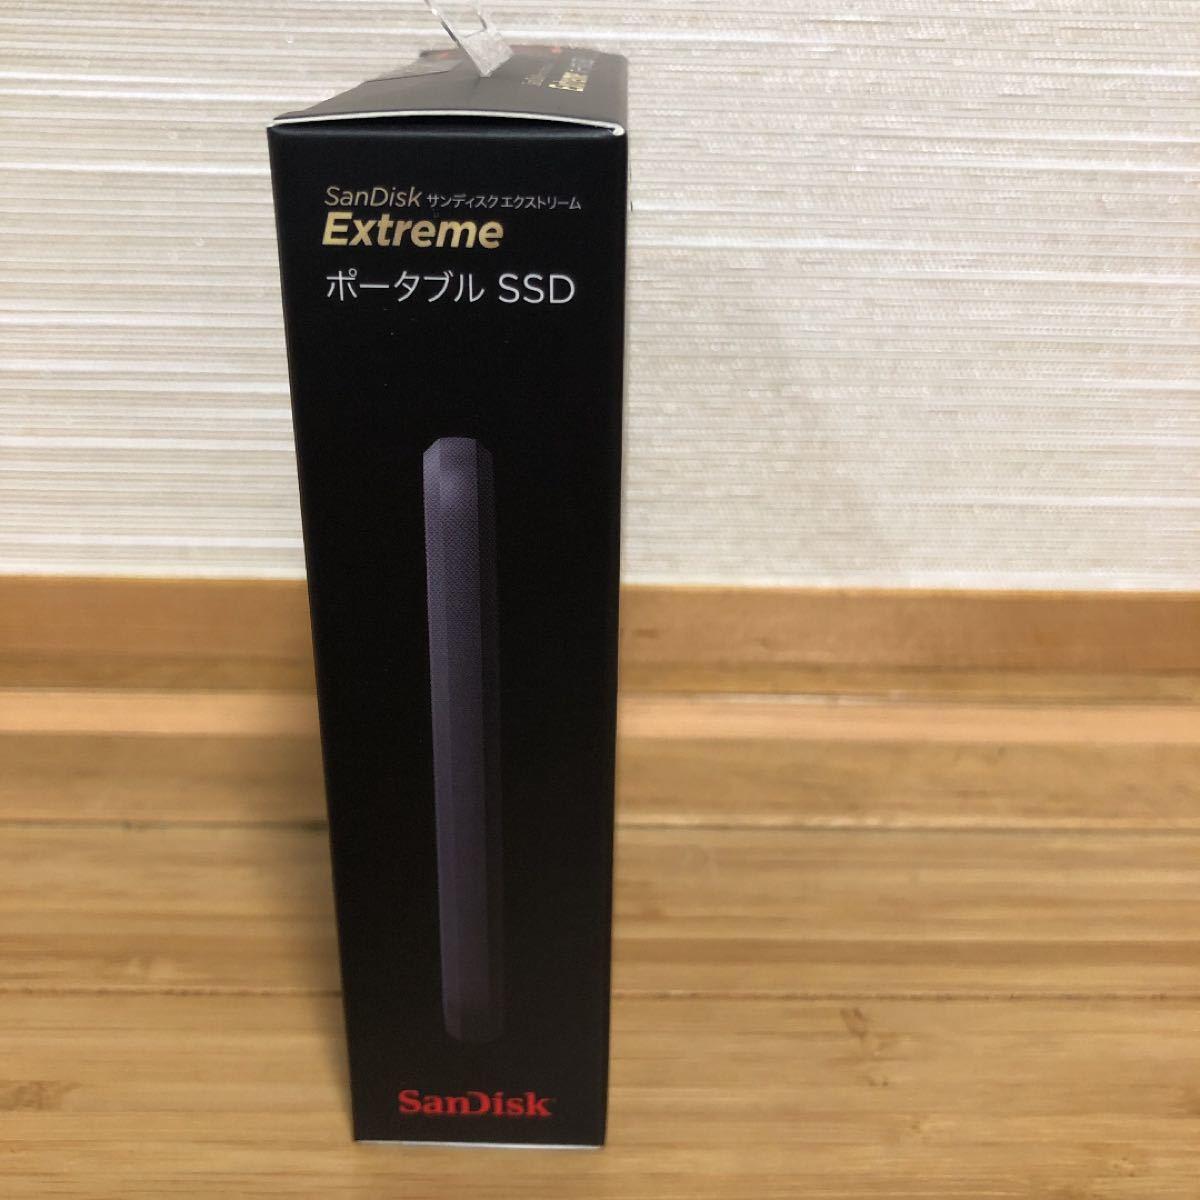 SanDisk Extreme ポータブルSSD 500GB  サンディスク USB3.1 耐衝撃、防滴、防塵、エクストリーム